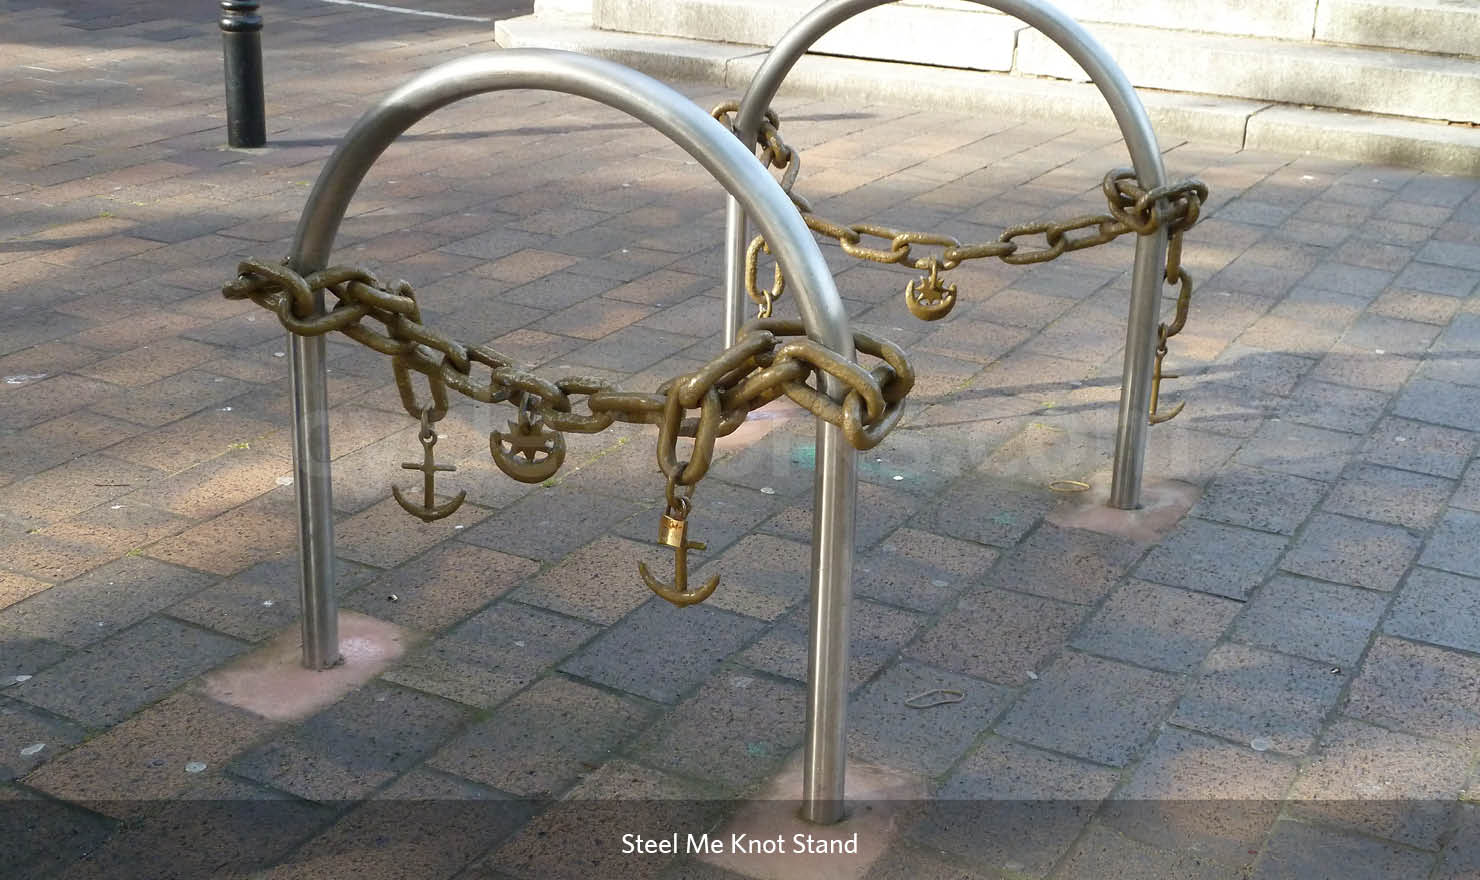 Steel Me Knot Bike Rack